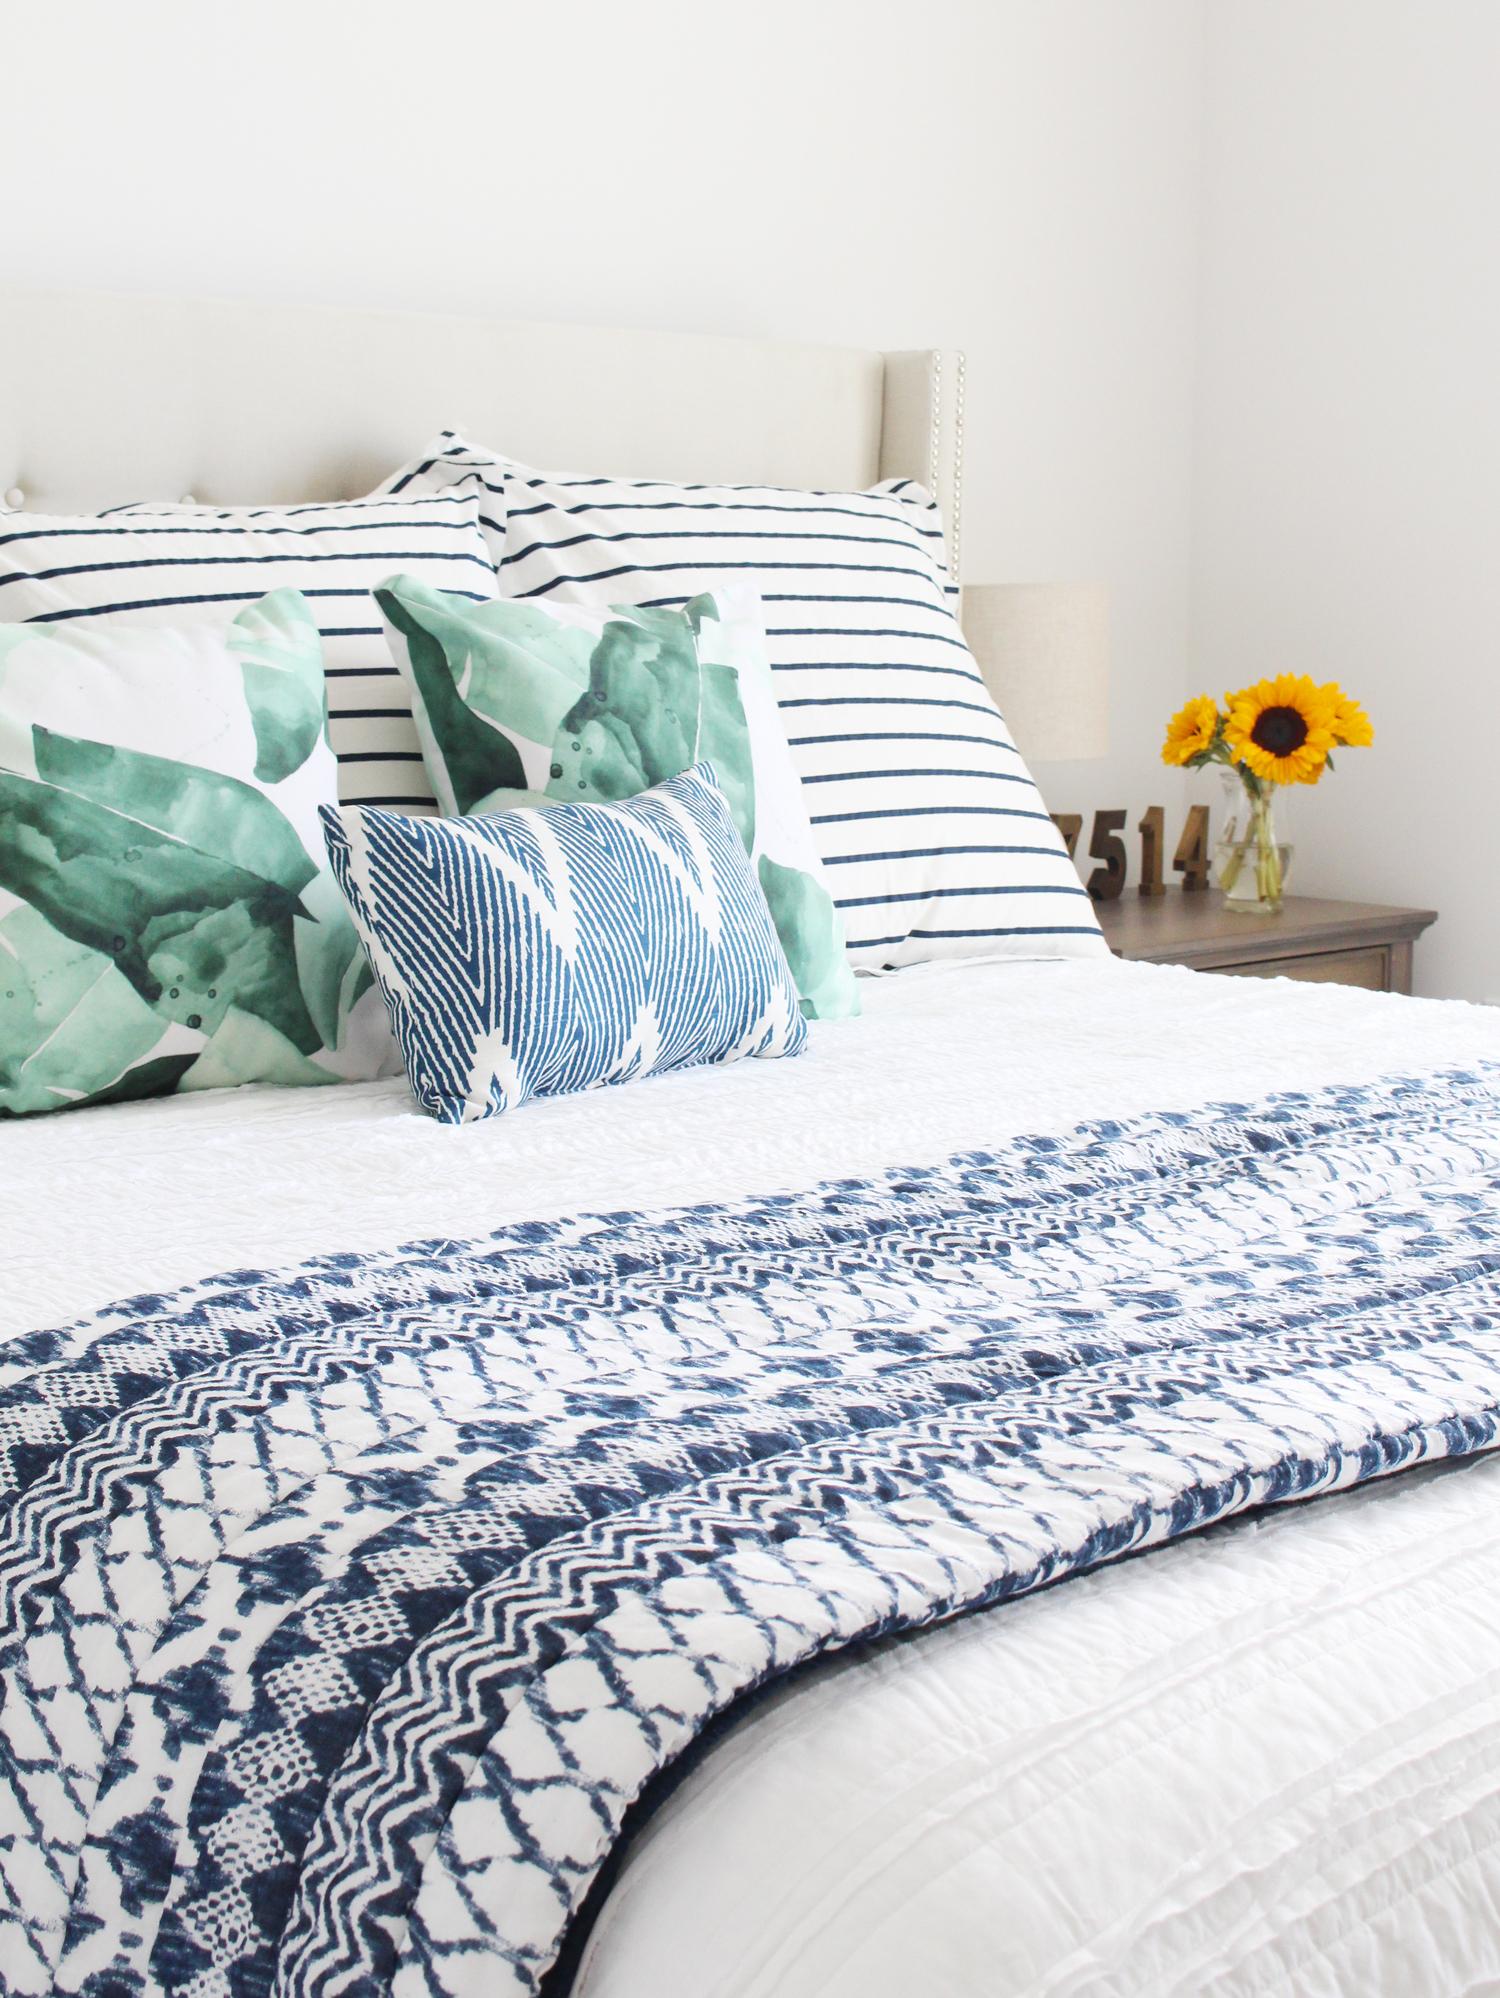 Modern-Farmhouse-Bedroom-Blue-Green-White-Mix-&-Match-Design-6.jpg